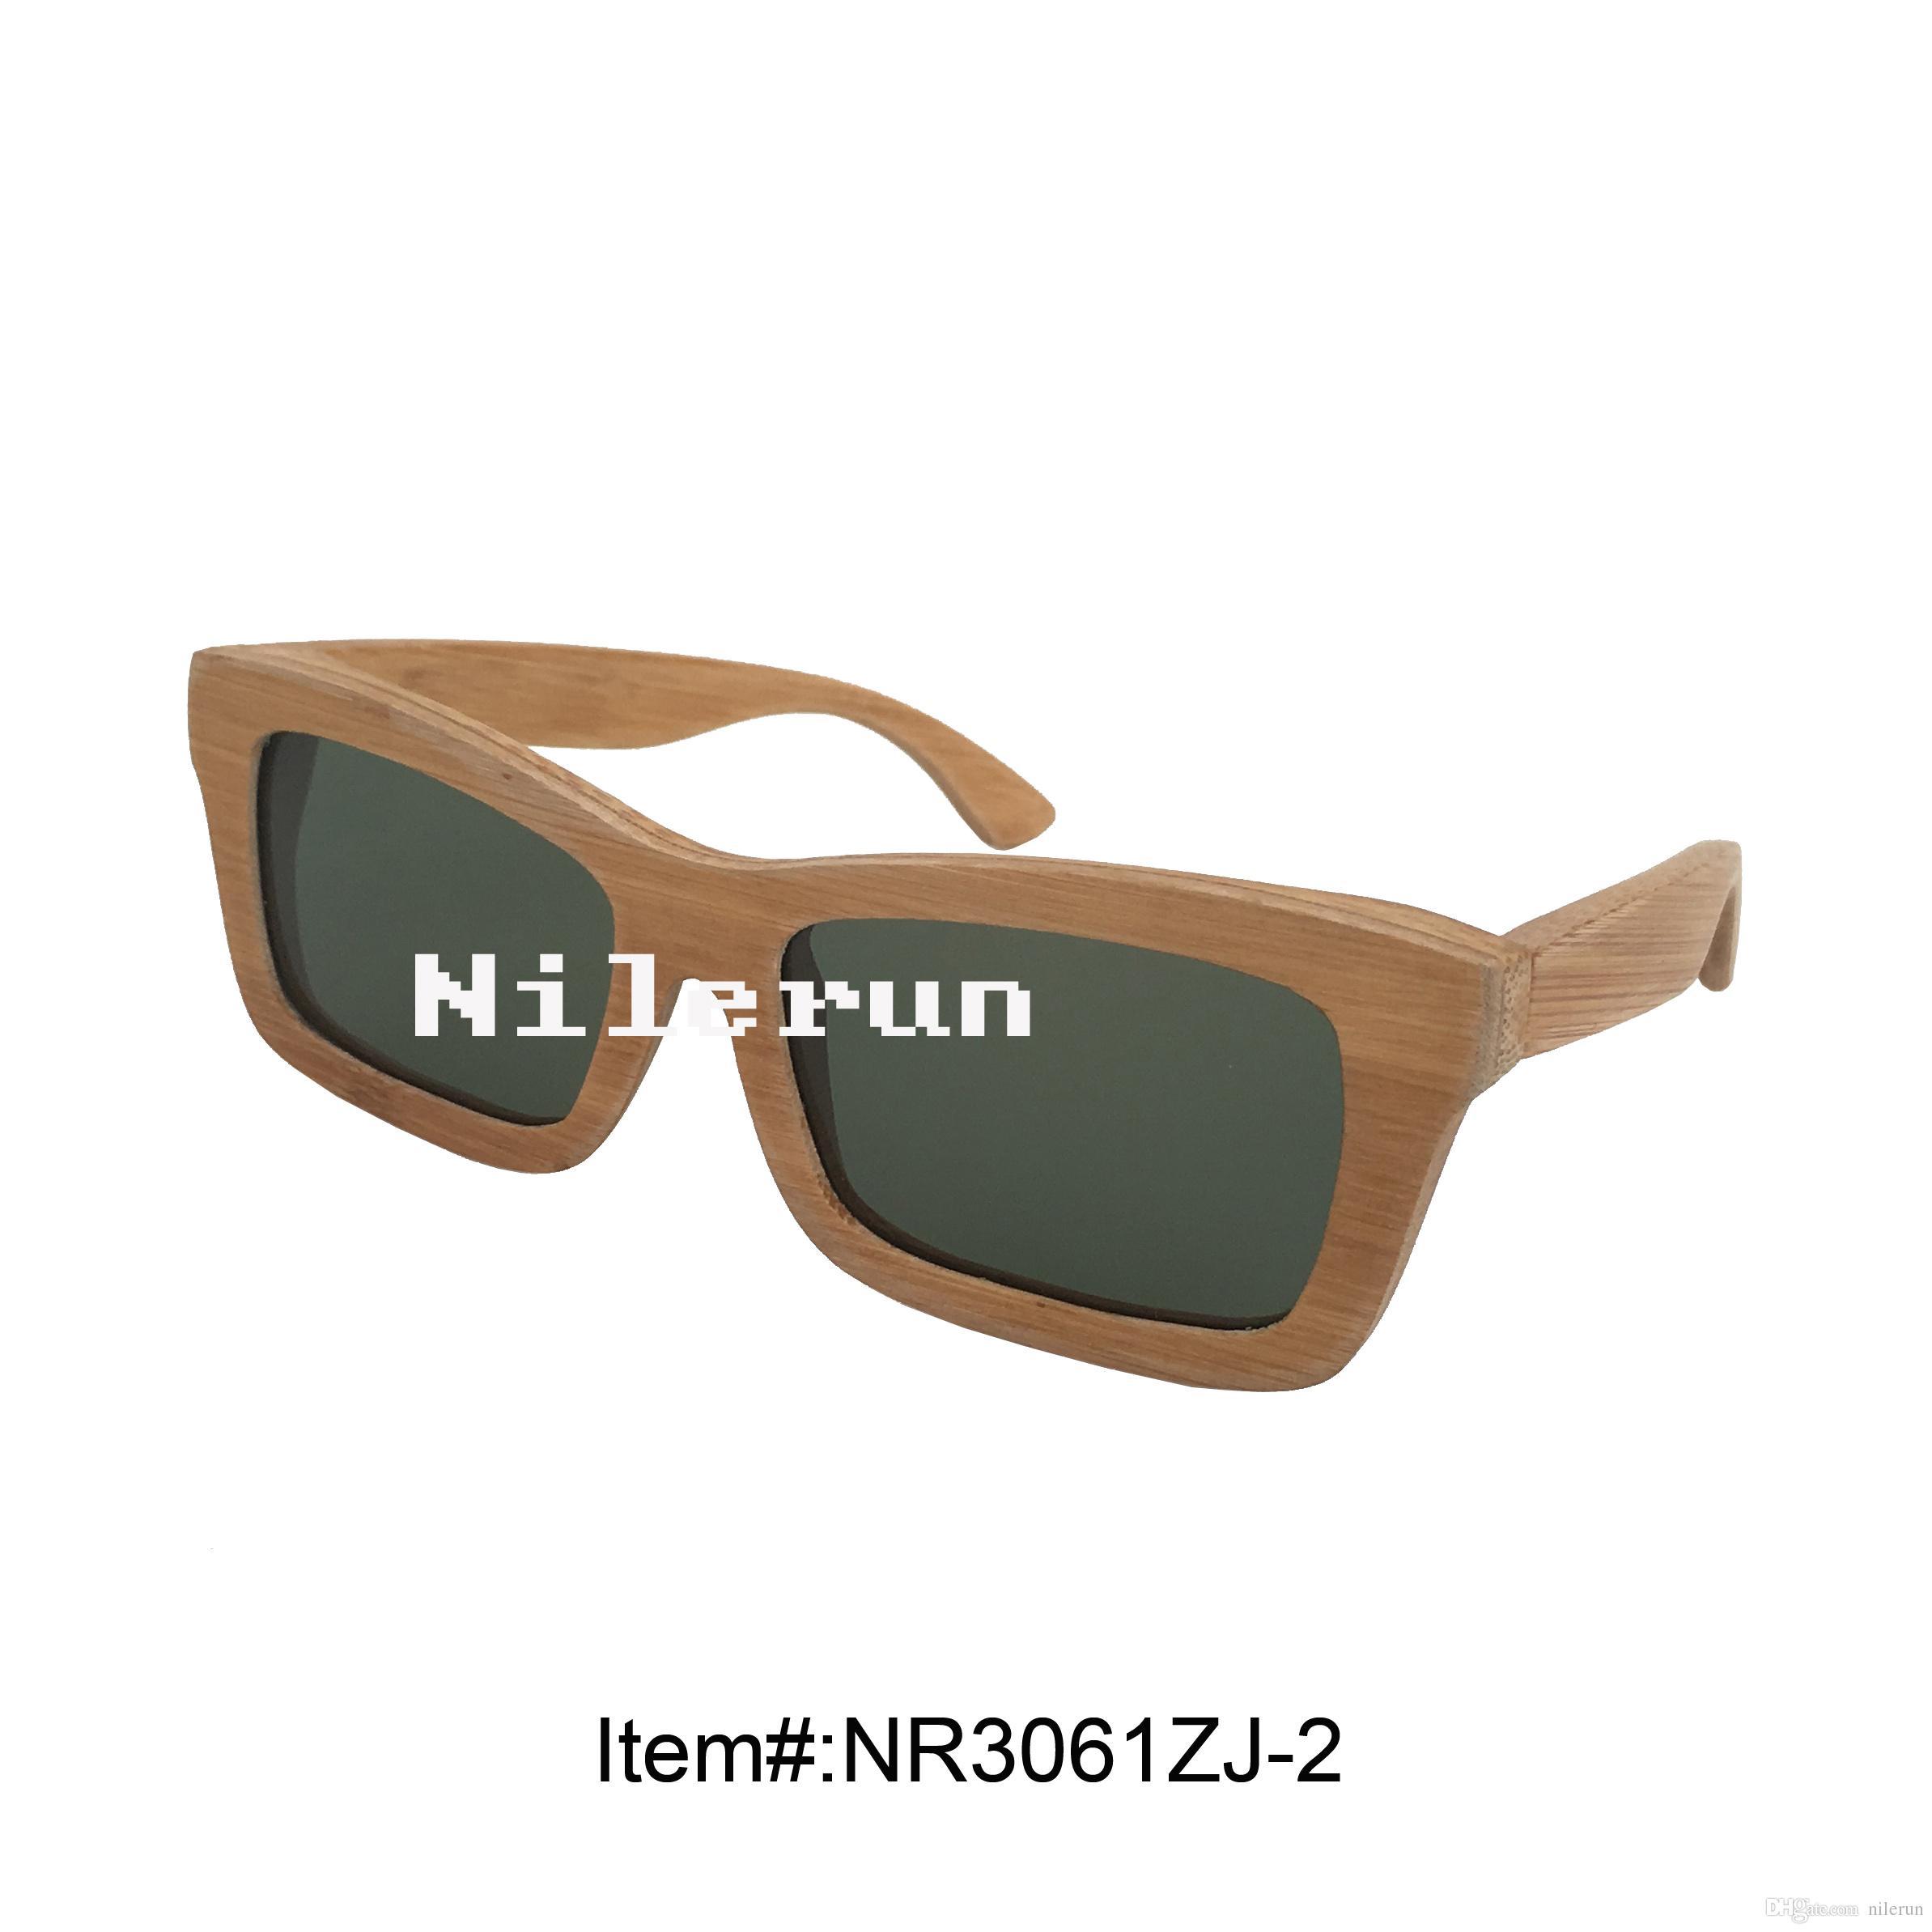 6a3f7b8550 Compre Clásico Cuadrado Presionado Gafas De Sol Bordo De Bambú A $13.07 Del  Nilerun   Dhgate.Com